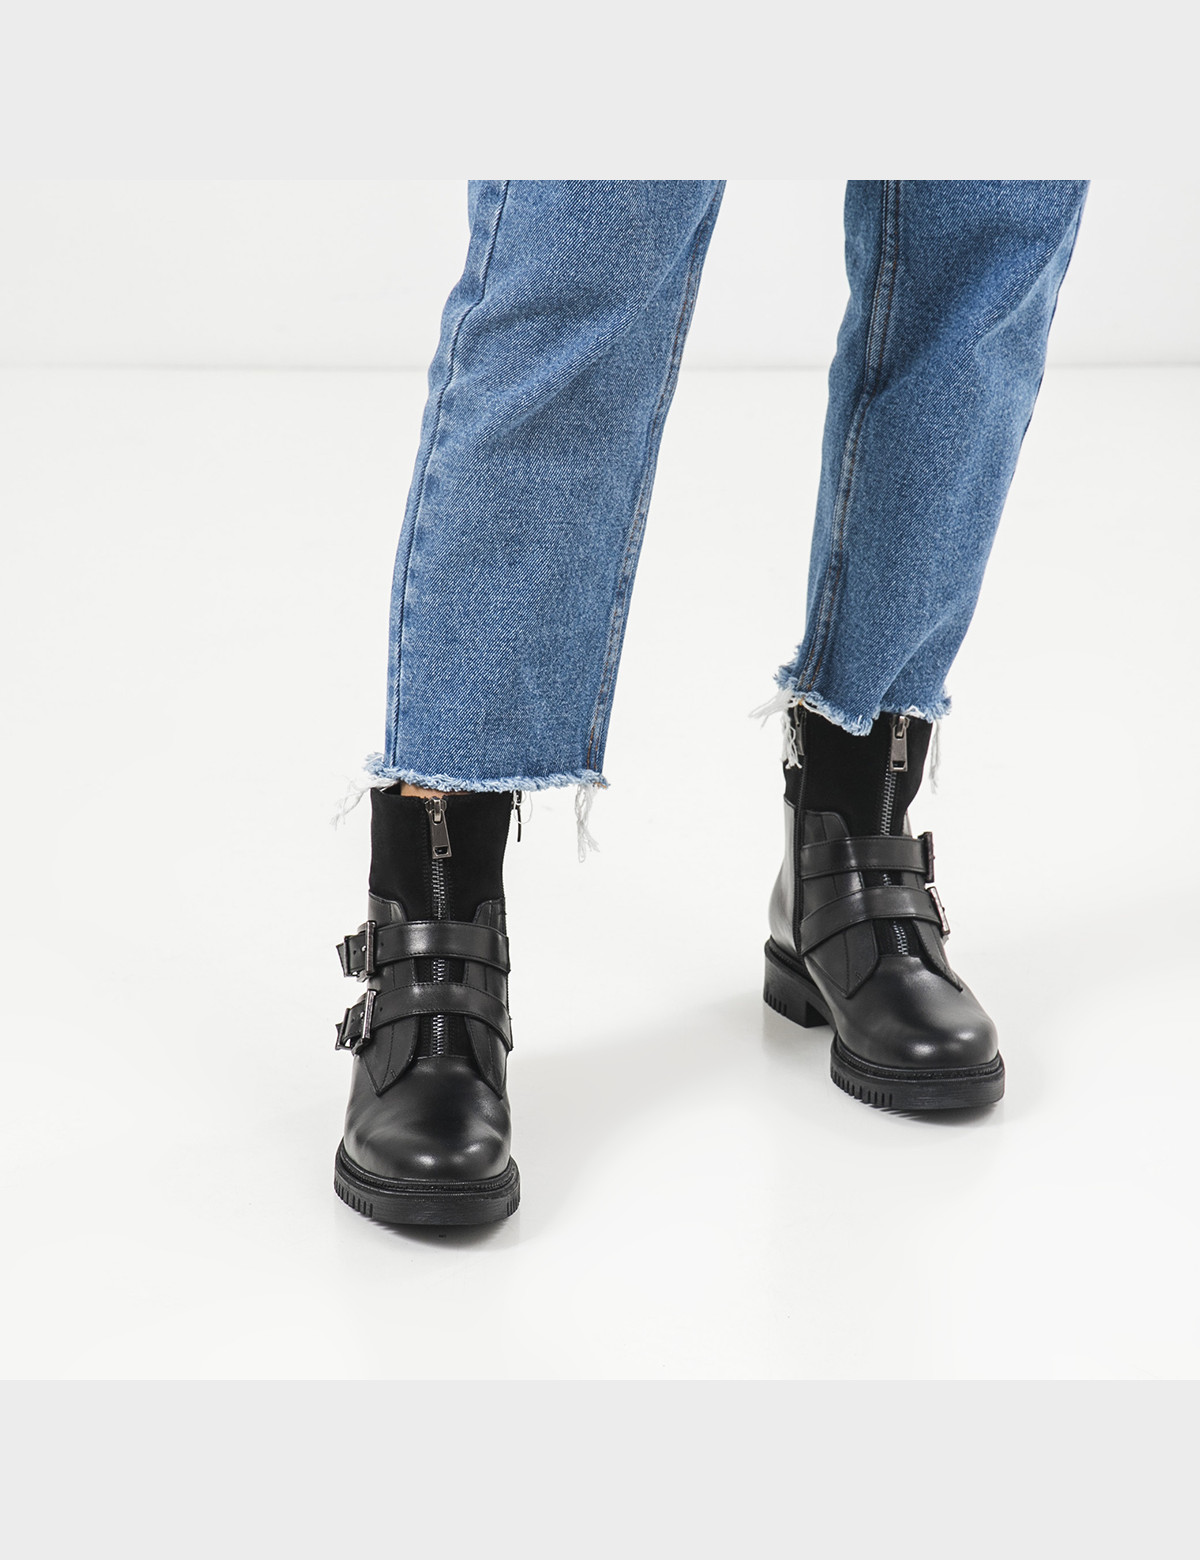 Ботинки, натуральная кожа/замша. Байка5